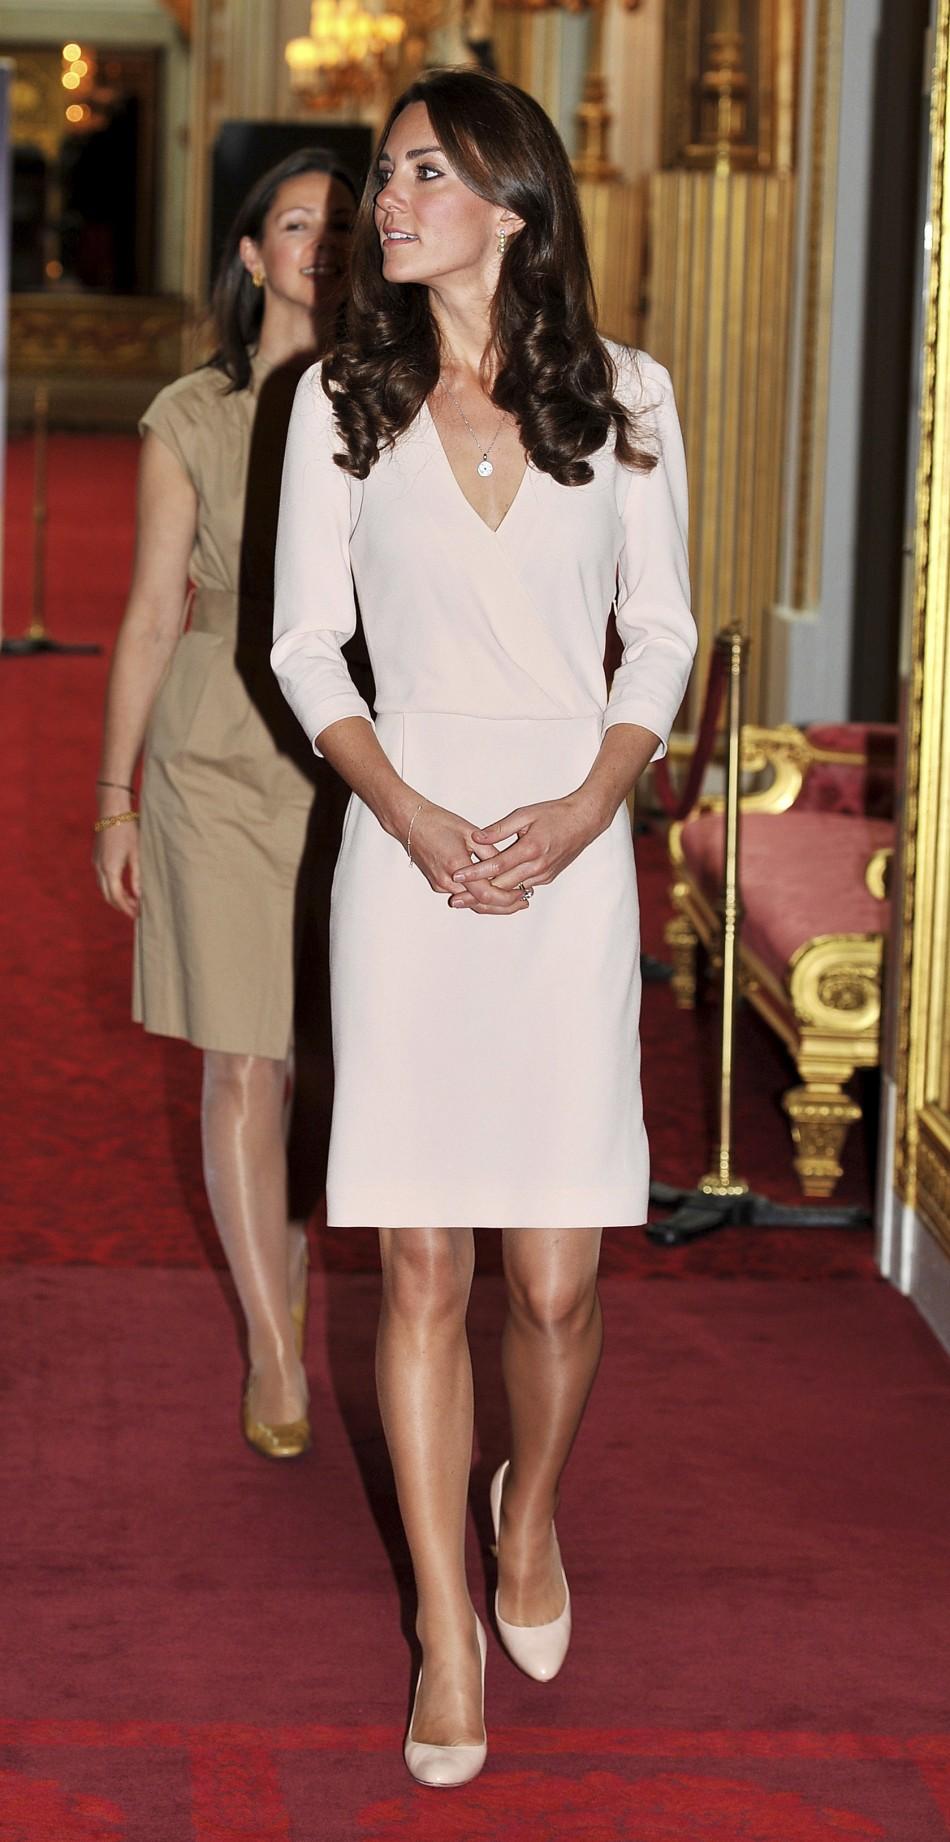 Kate Middleton Powers Winter Hosiery Sales Photos